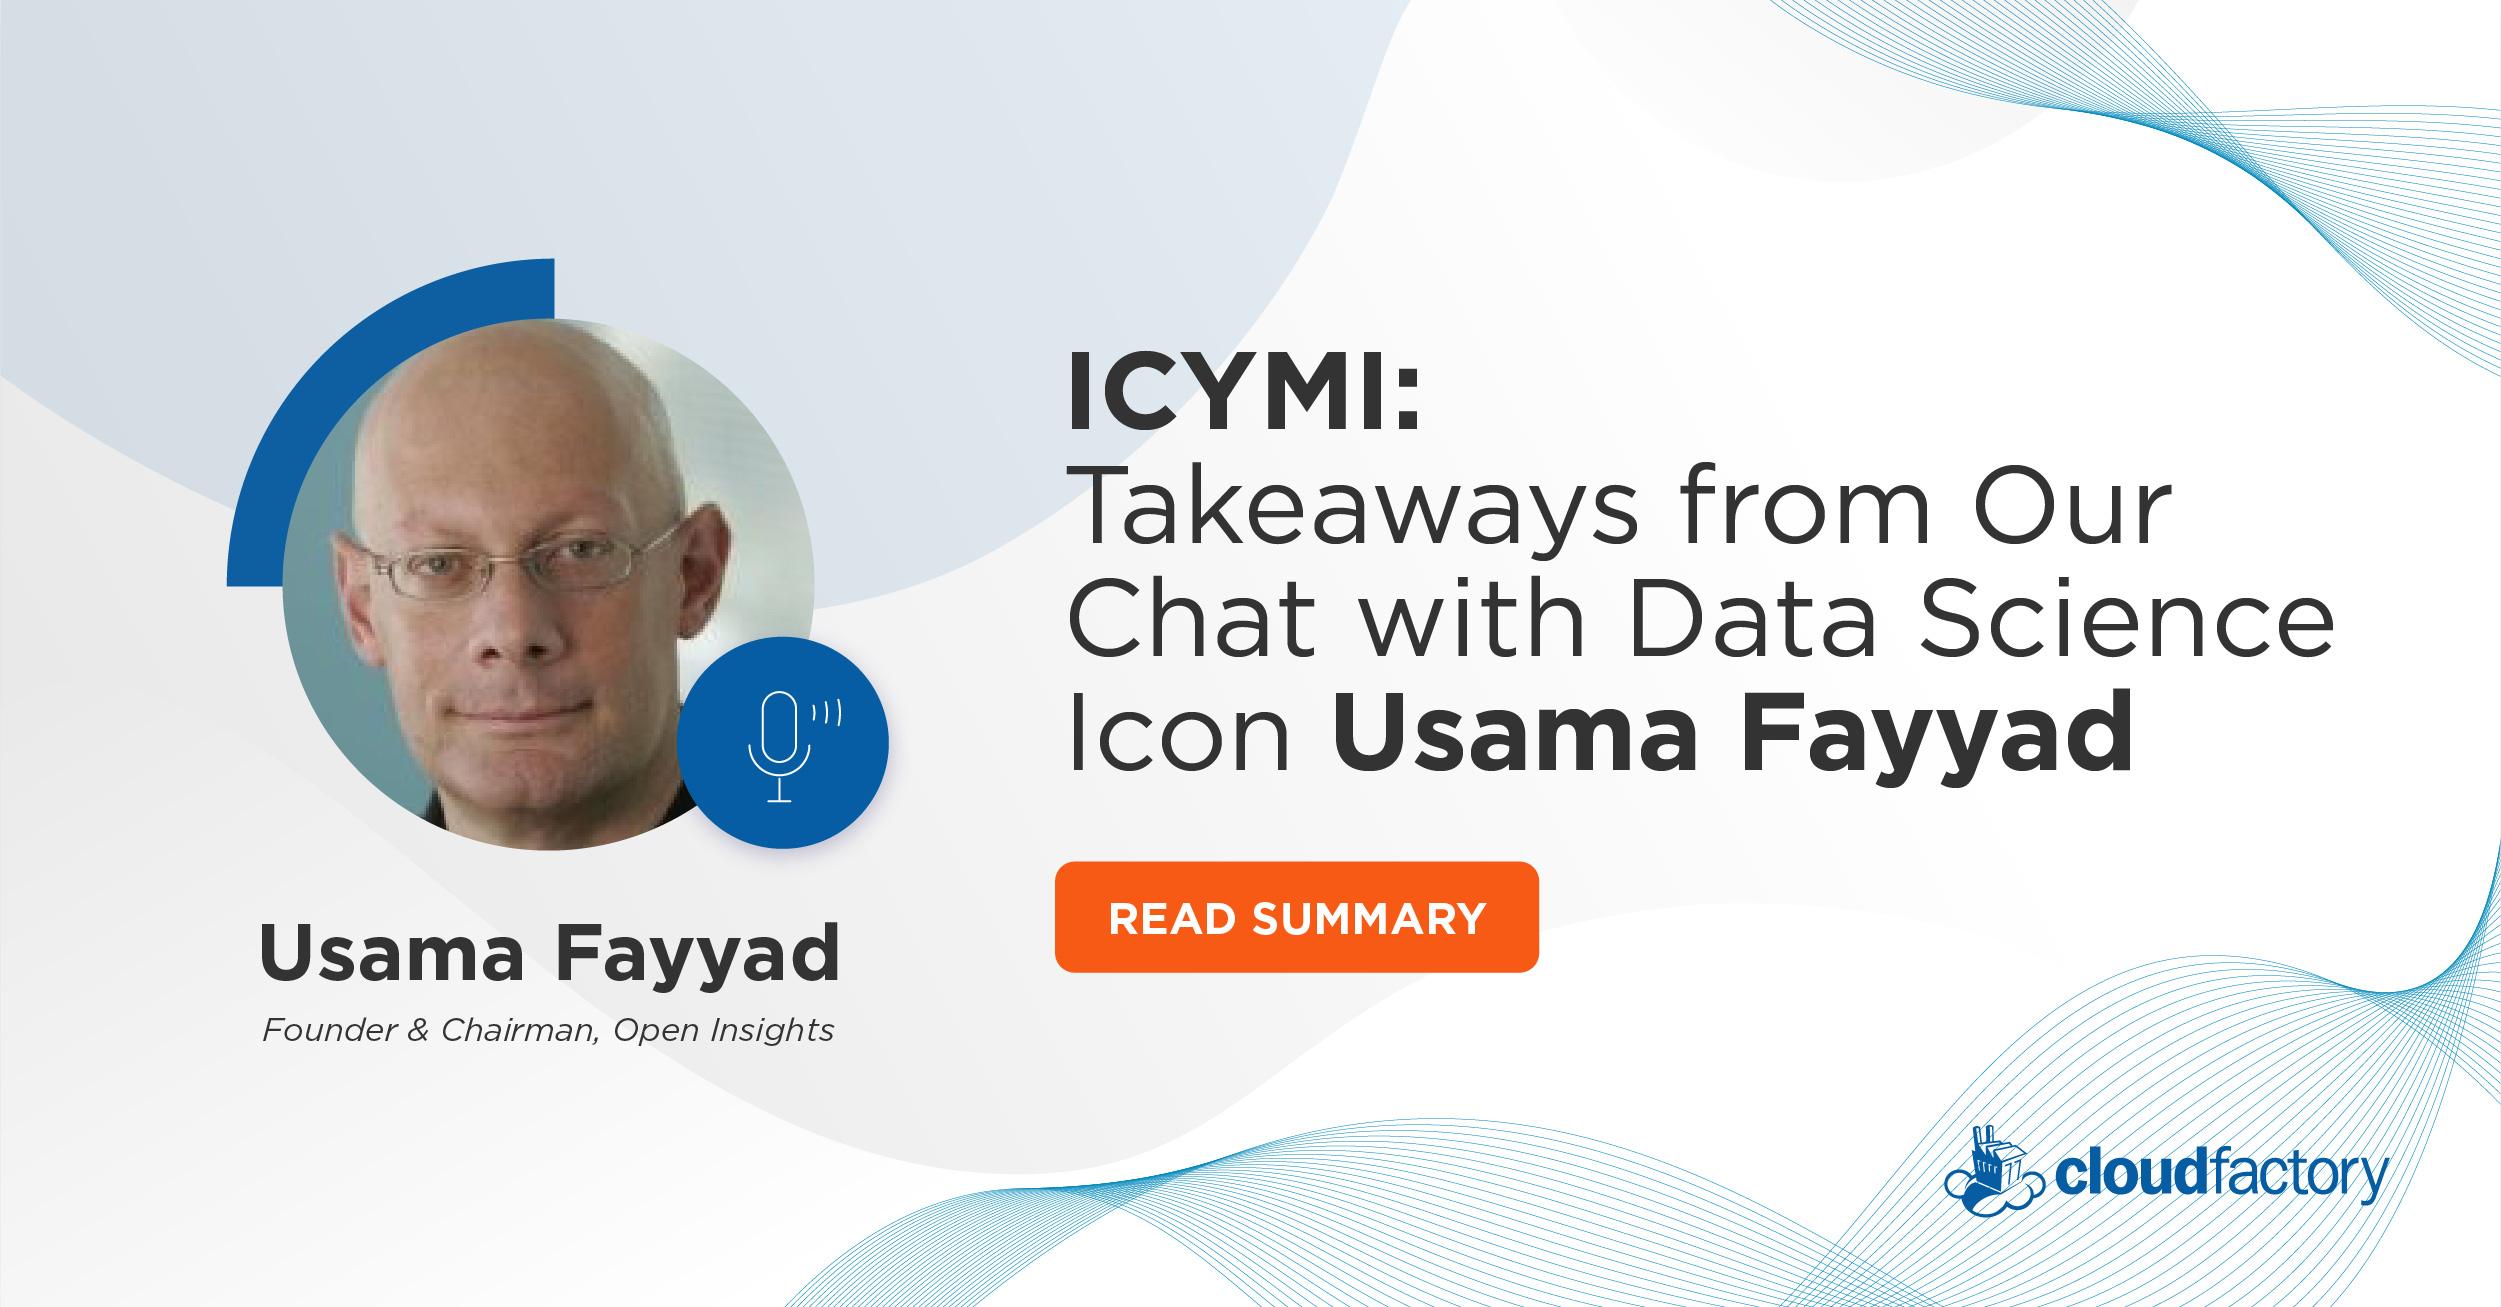 ICYMI: Key Insights fromData Science Icon Usama Fayyad